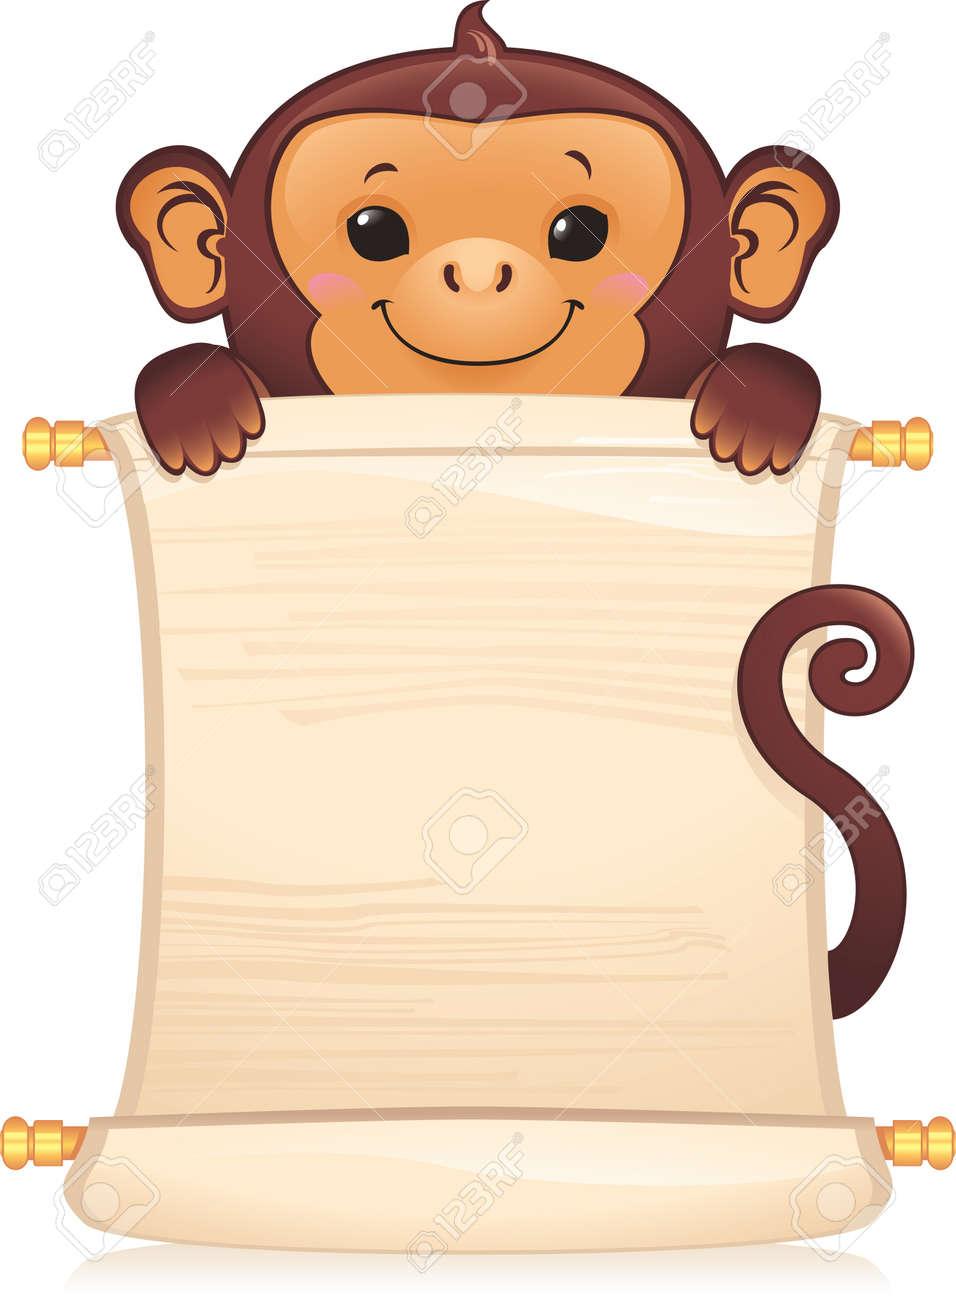 Symbol of Chinese horoscope - monkey with scroll - 8912622